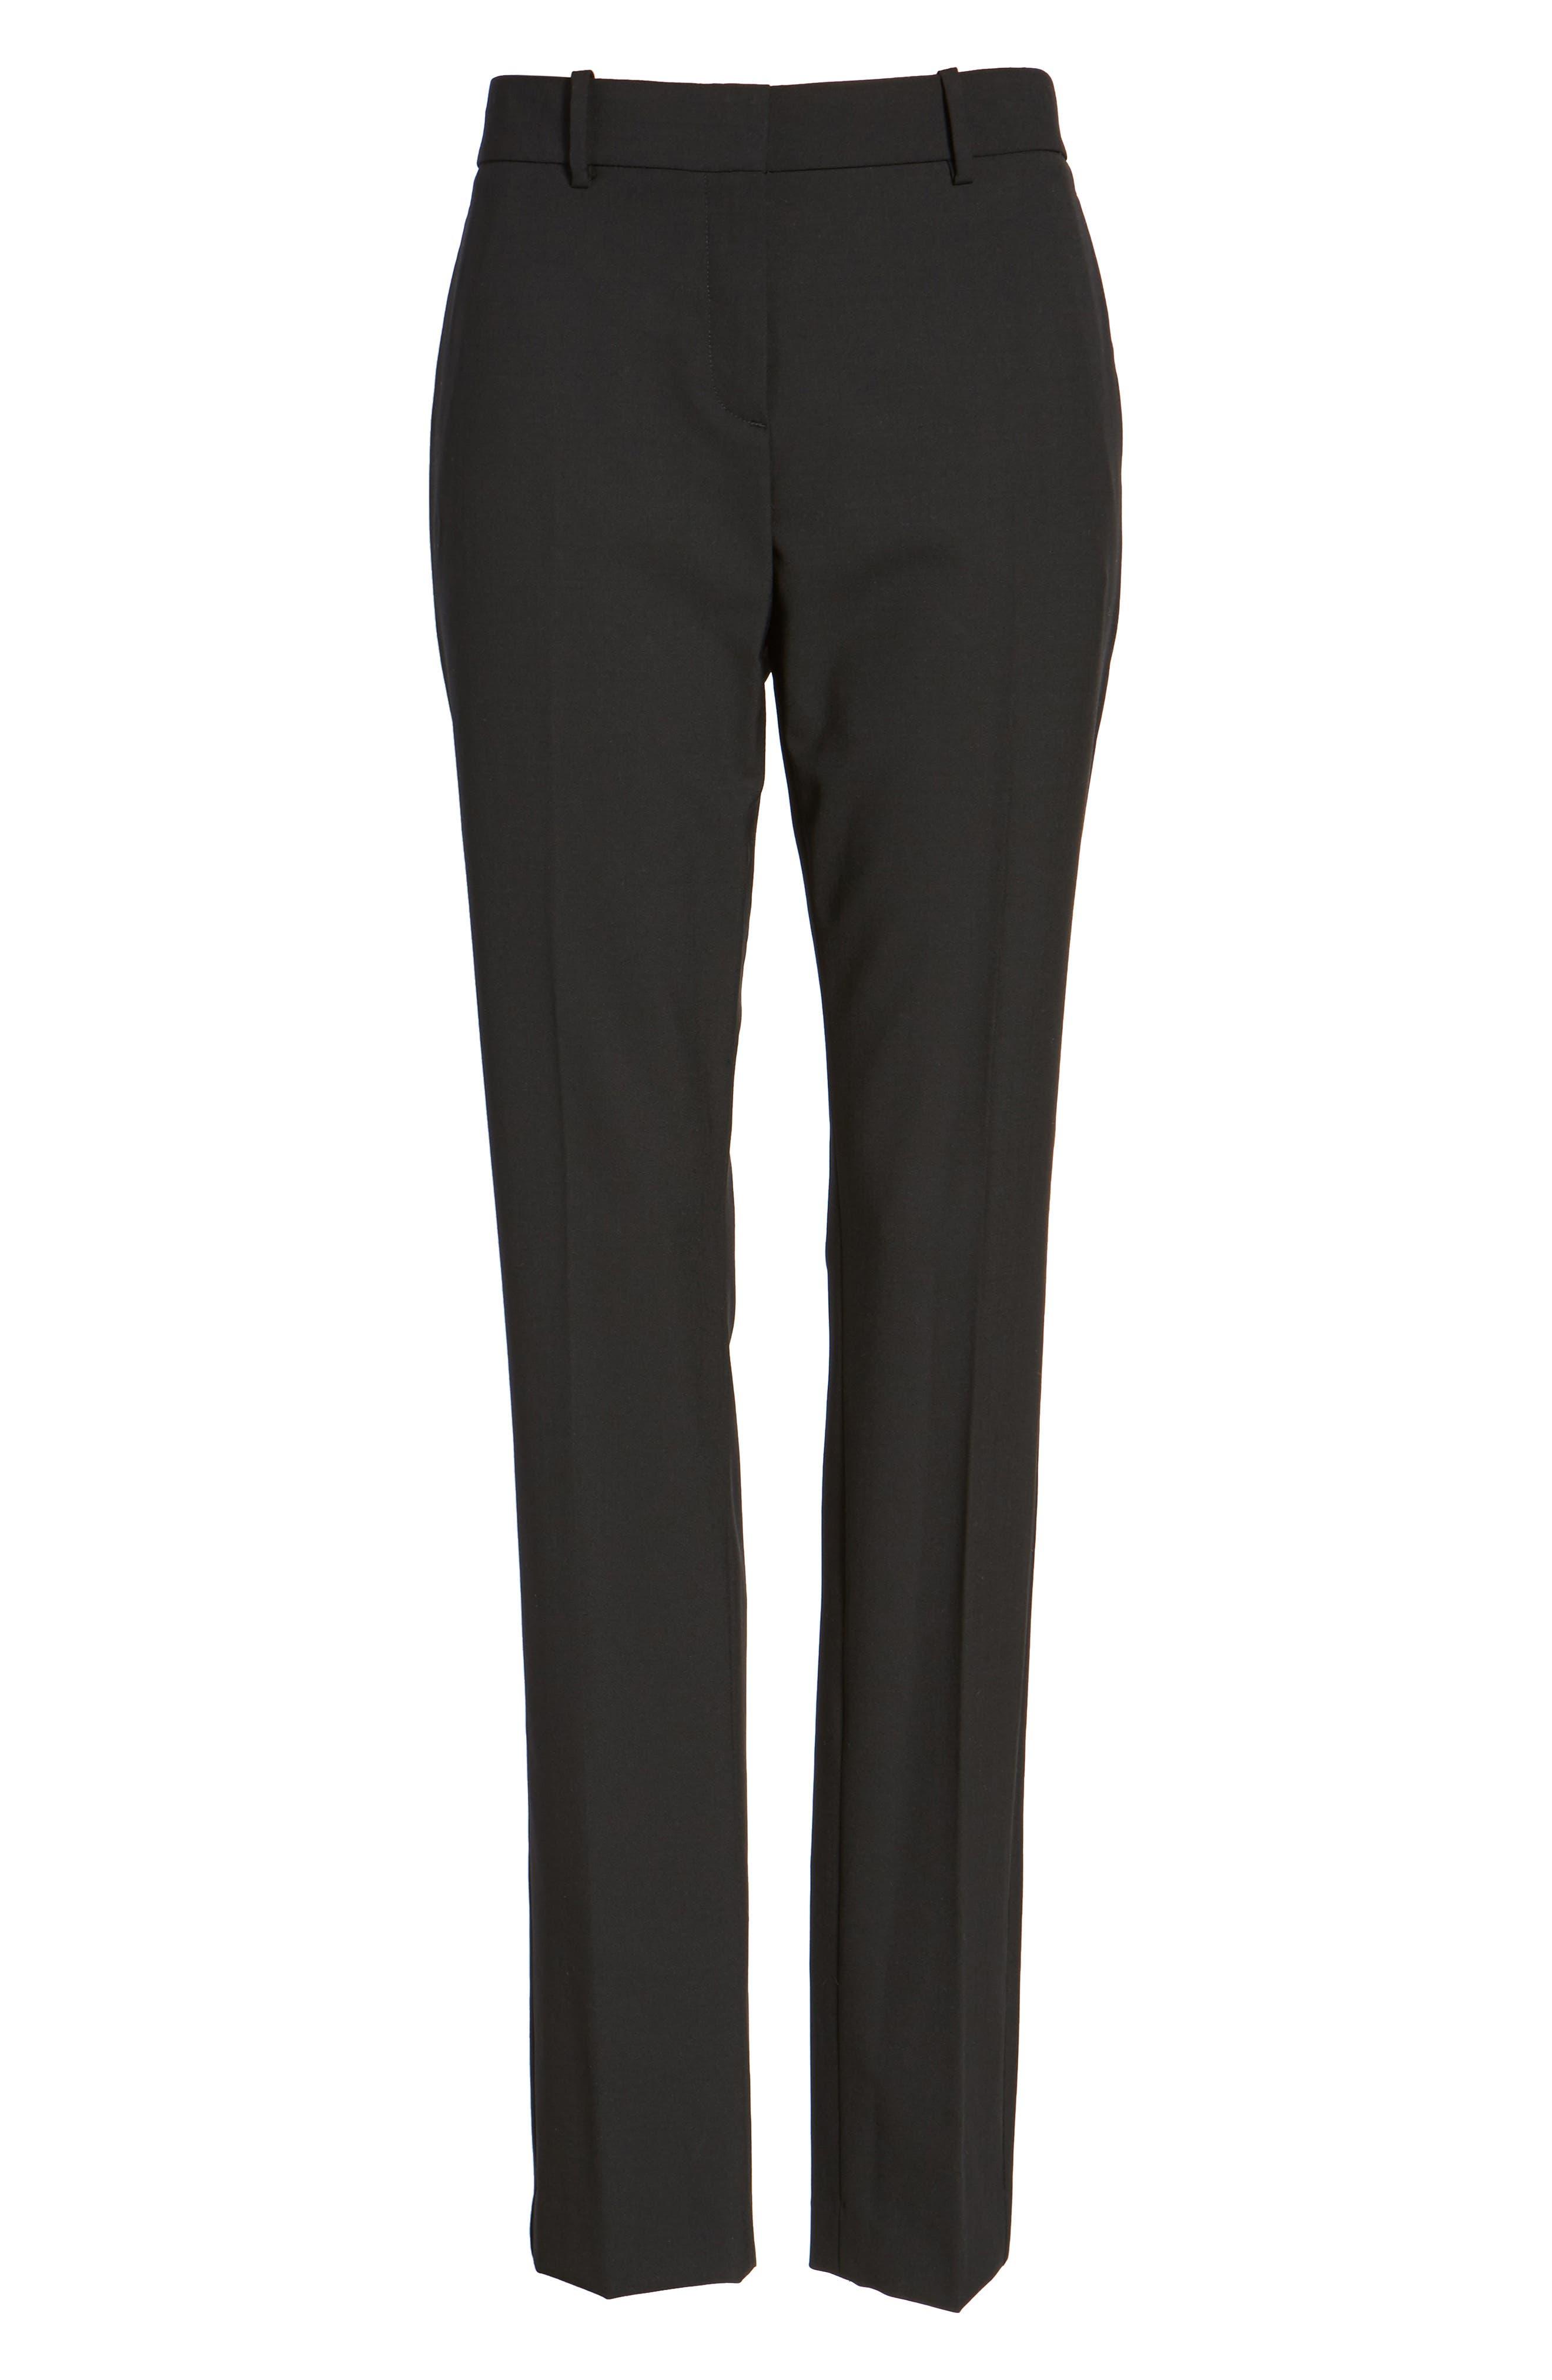 'Super Slim Edition' Stretch Wool Pants,                             Alternate thumbnail 2, color,                             001